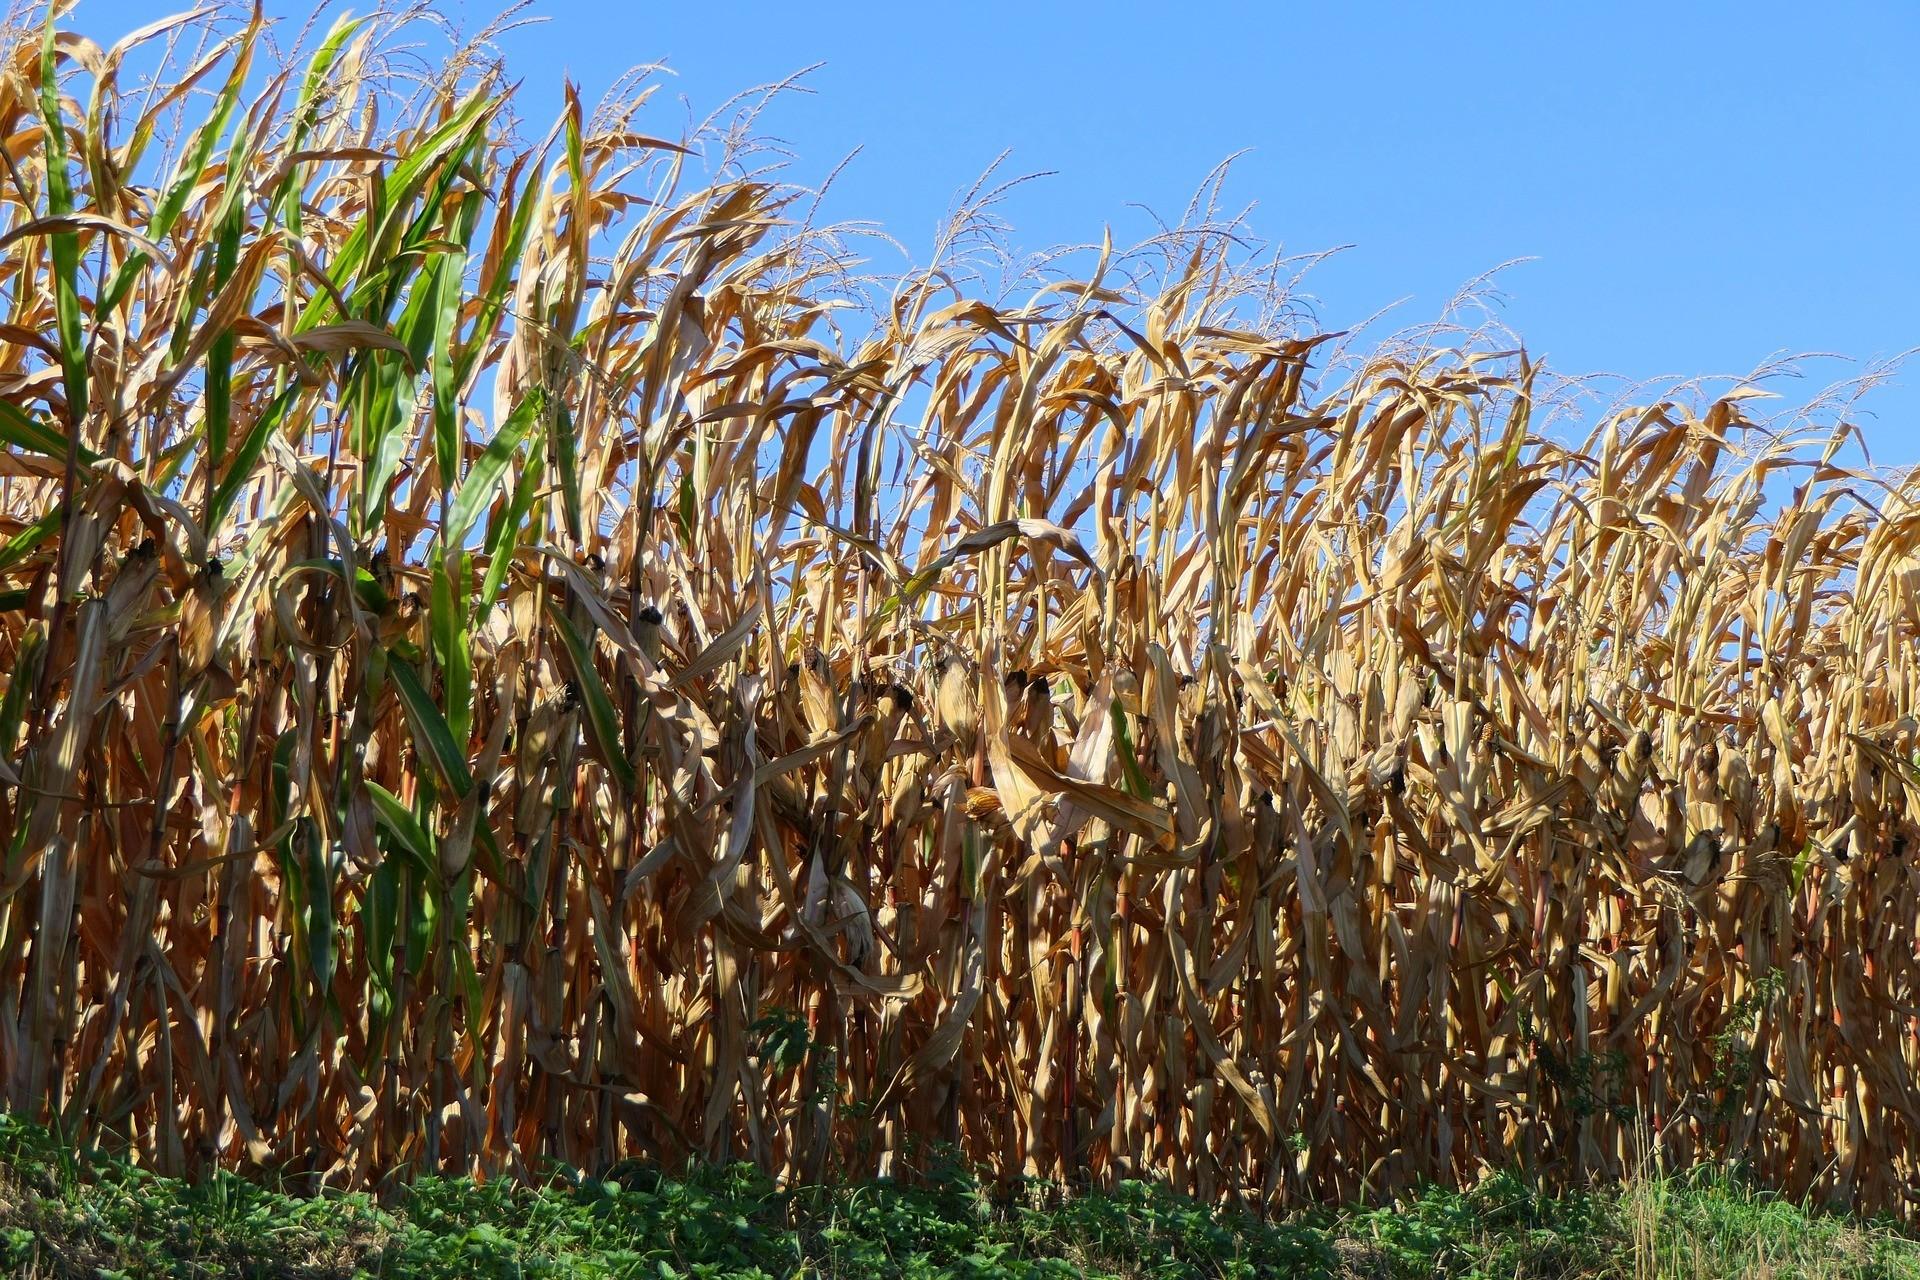 image of crops being grown